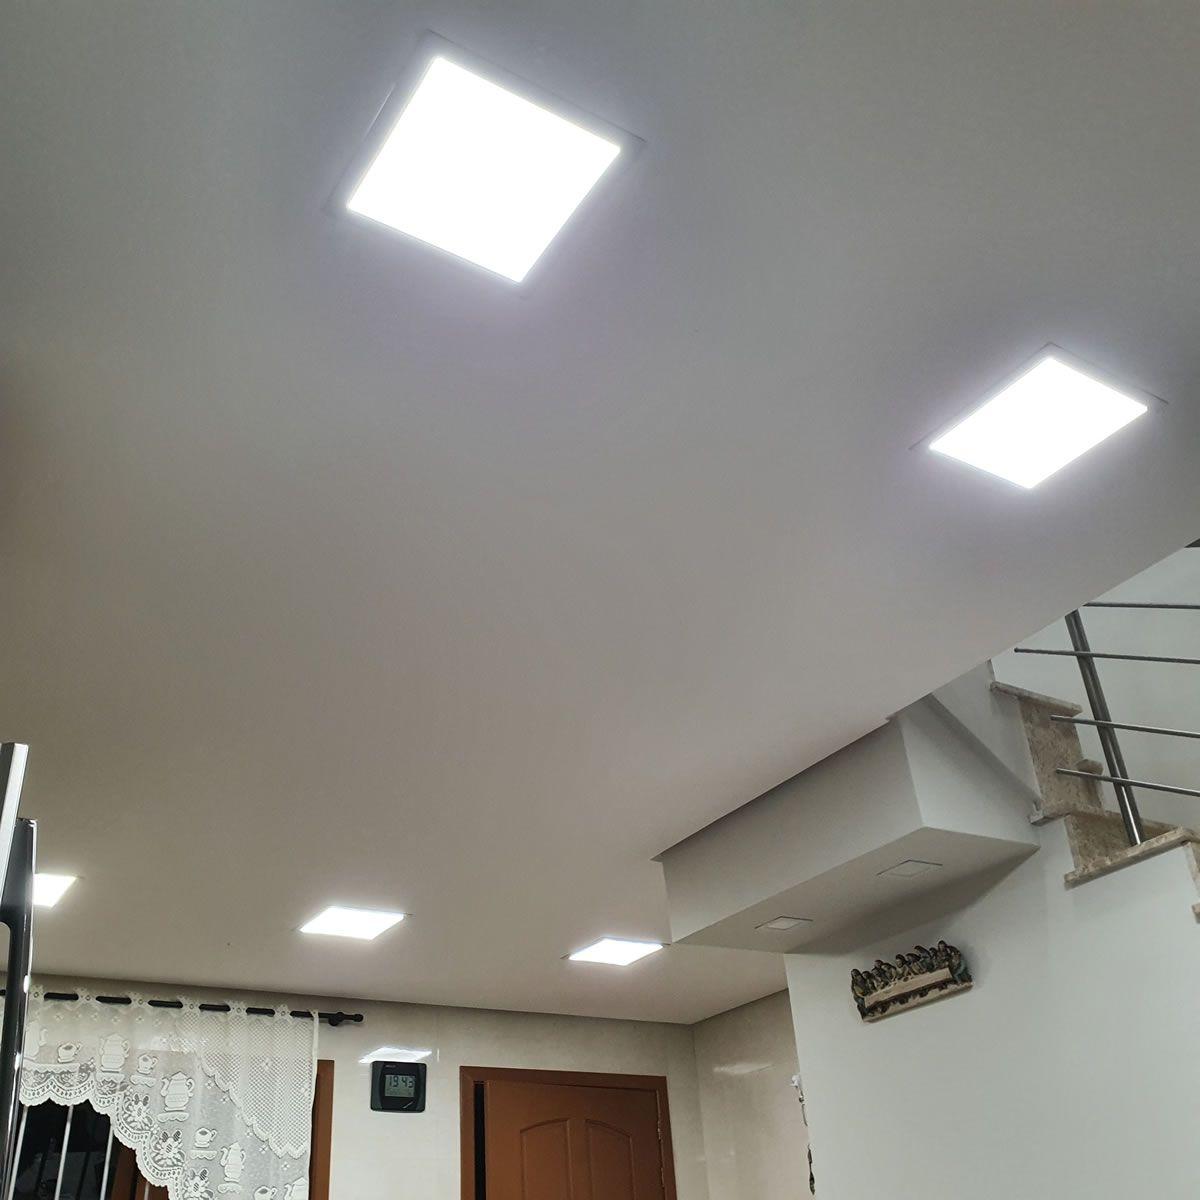 KIT 5 Painel Plafon LED 36w Quadrado Embutir Branco Frio Luminária